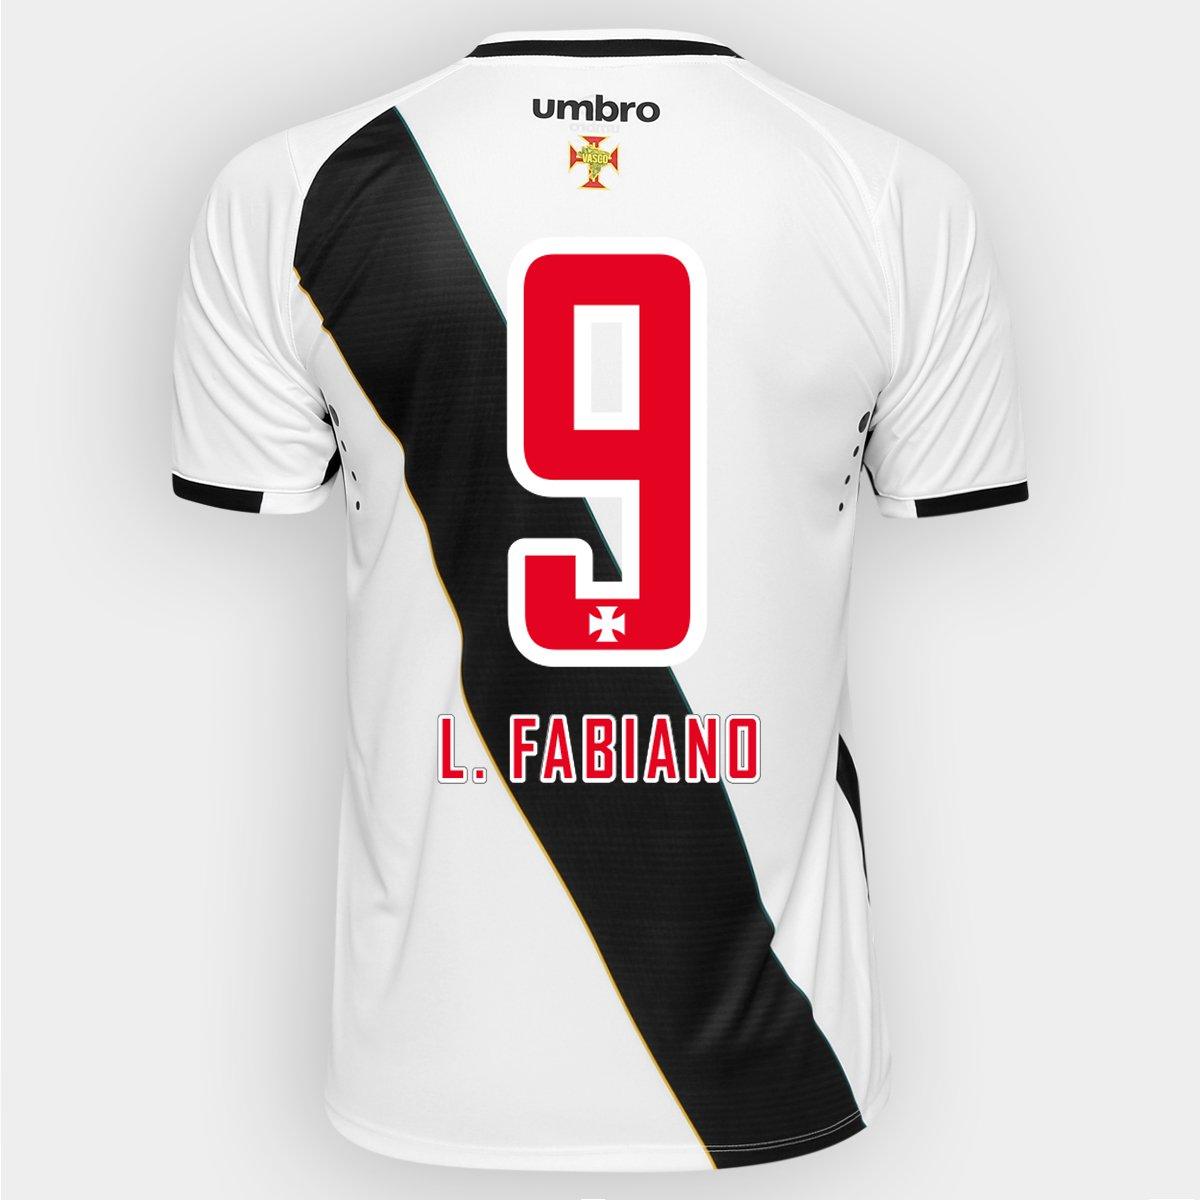 770ad67f9 Camisa Umbro Vasco II 16 17 Nº 9 - L. Fabiano - Compre Agora